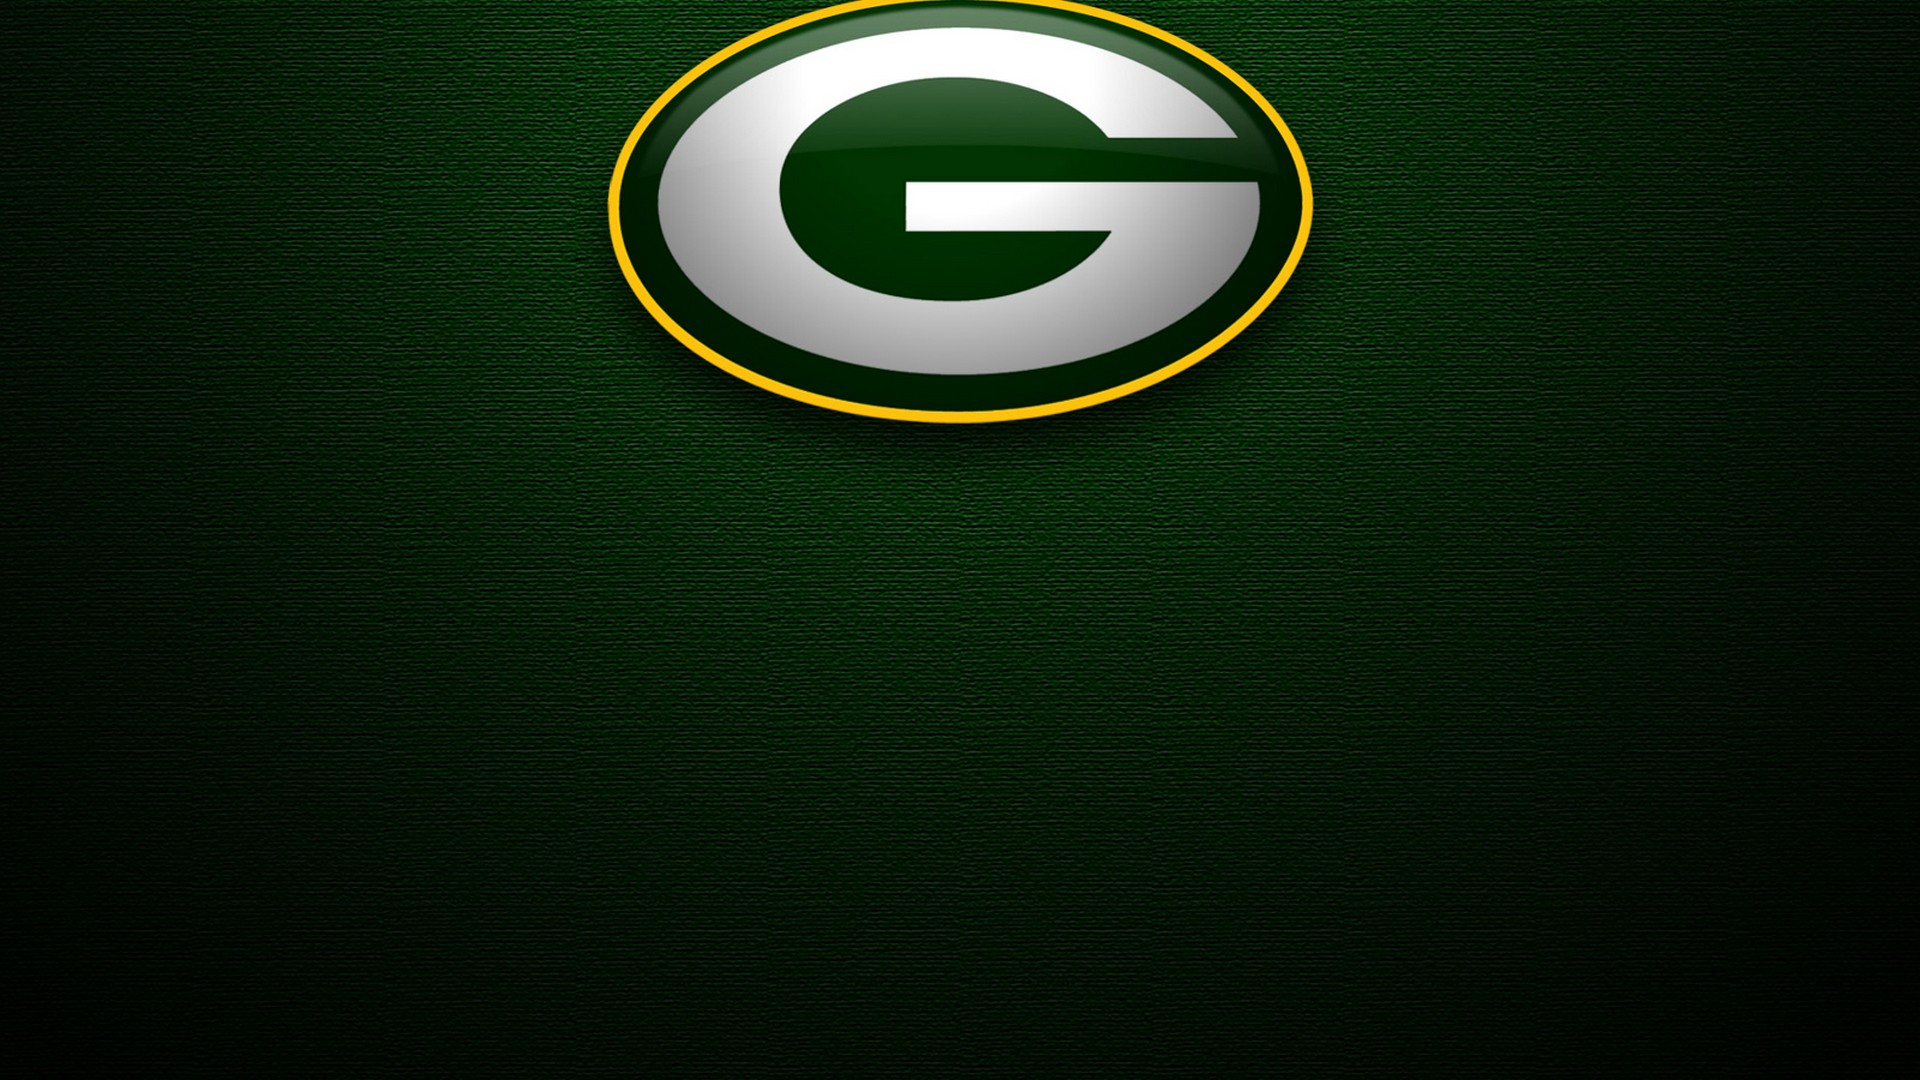 Green Bay Packers Nfl Desktop Wallpaper With Resolution - Green Bay Packers - HD Wallpaper